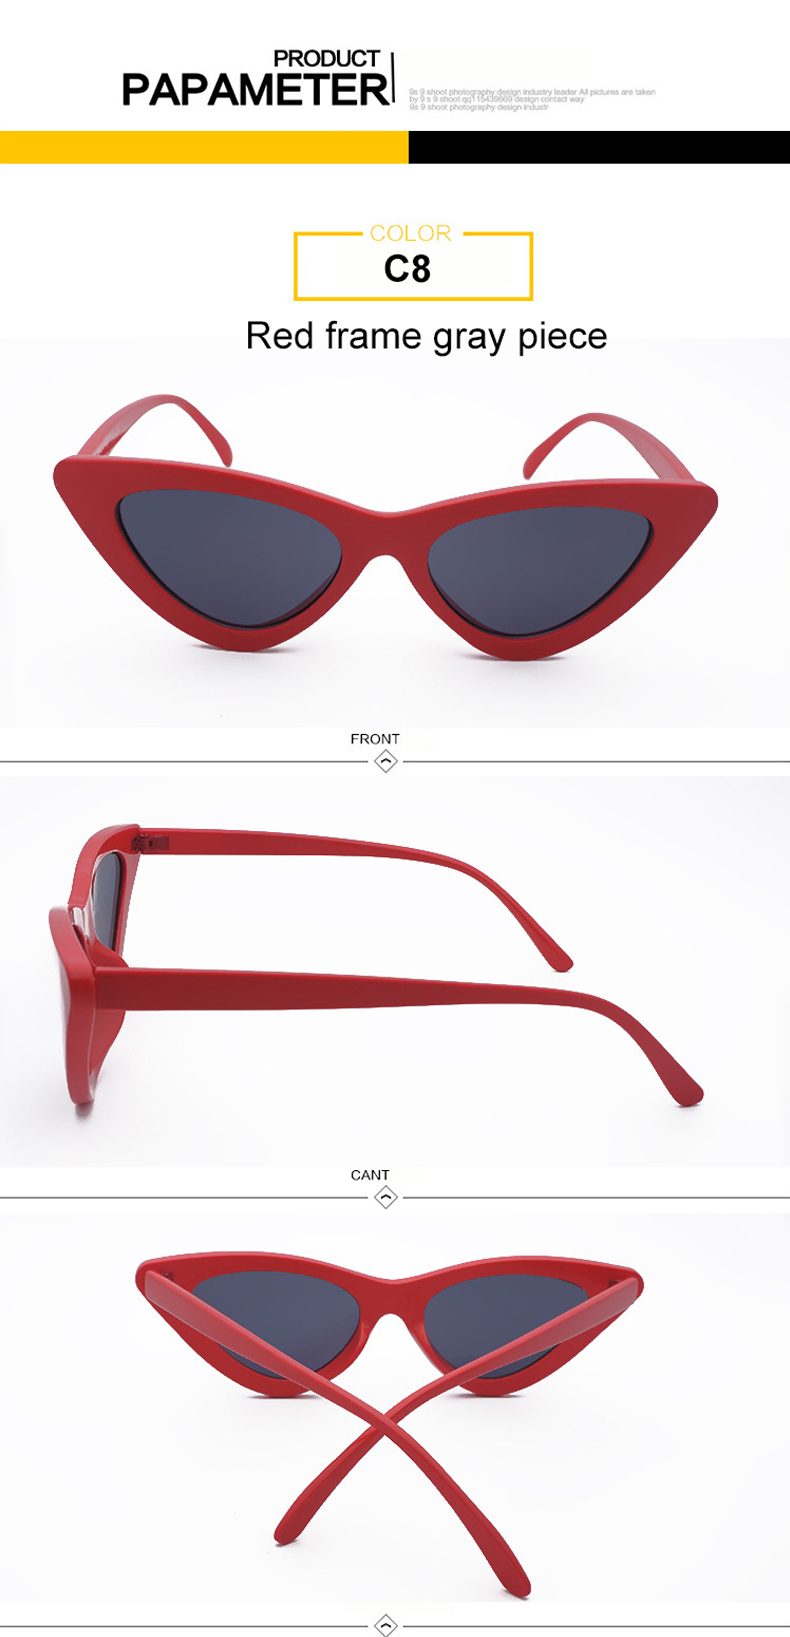 HTB1YnzRiLNNTKJjSspfq6zXIFXaB - WHO CUTIE 2018 Brand Designer Black Cat Eye Sunglasses Women Cool Small Cateye Frame Sun Glasses Fashion UV400 Shades WG-008